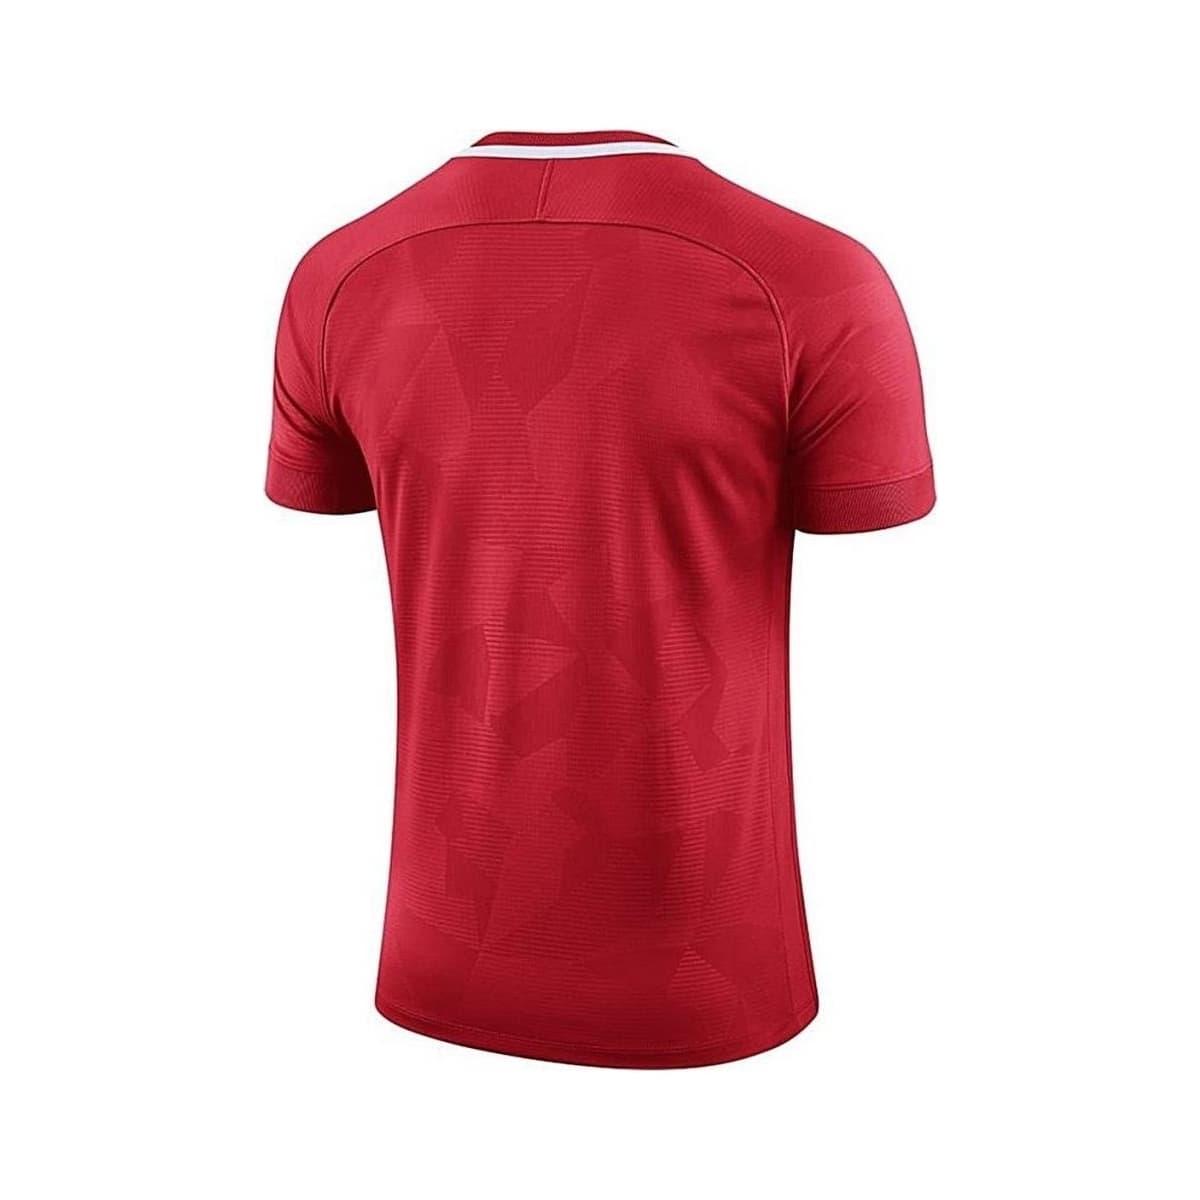 Dry Challenge II Kırmızı Futbol Forma (893964-657)